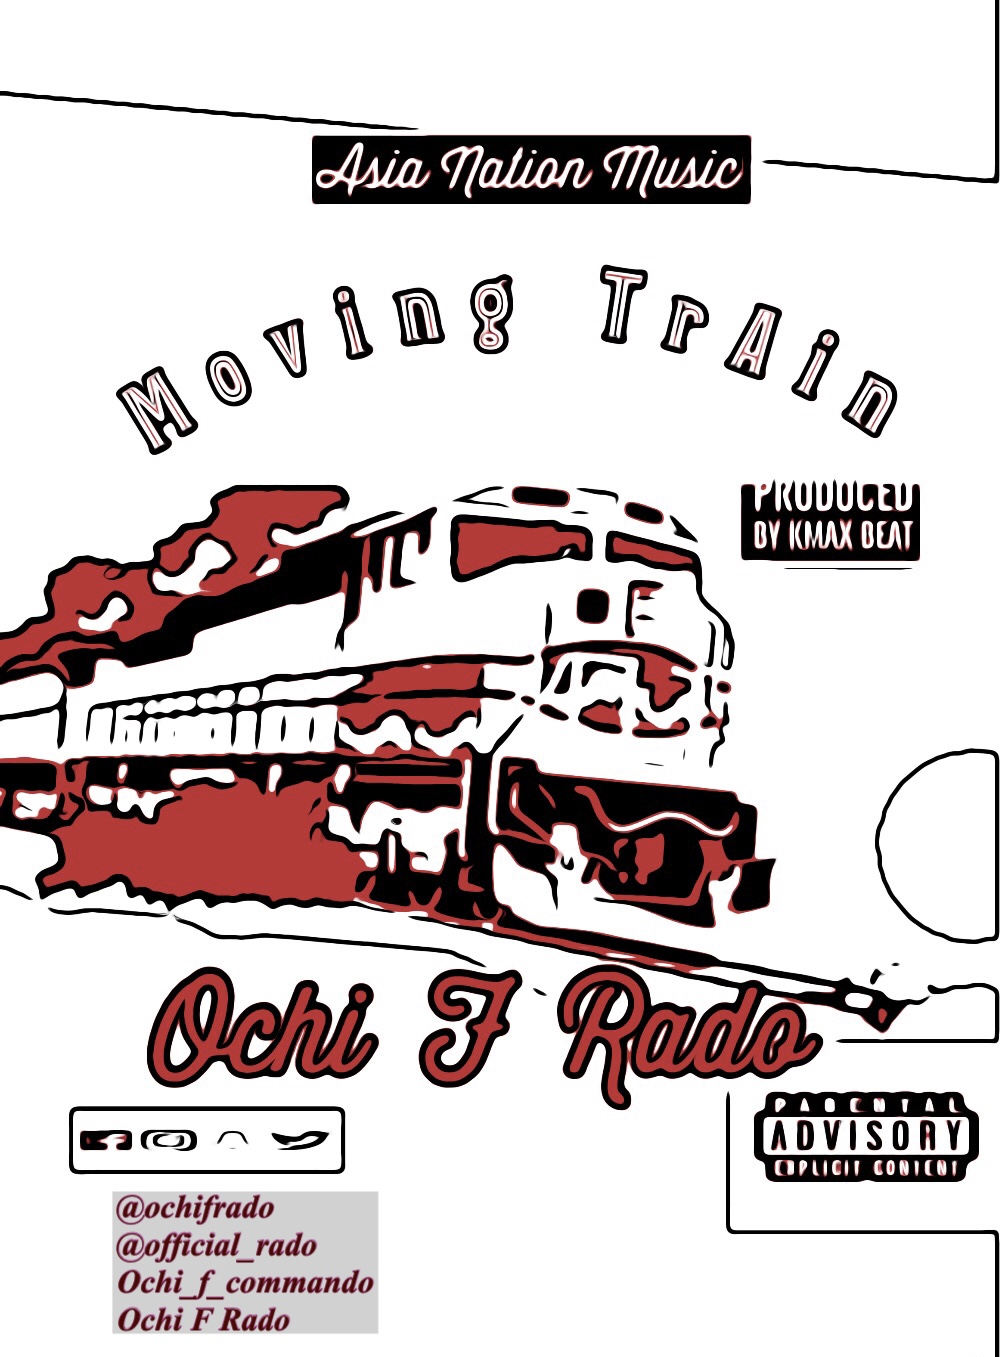 Ochi F - Moving Train